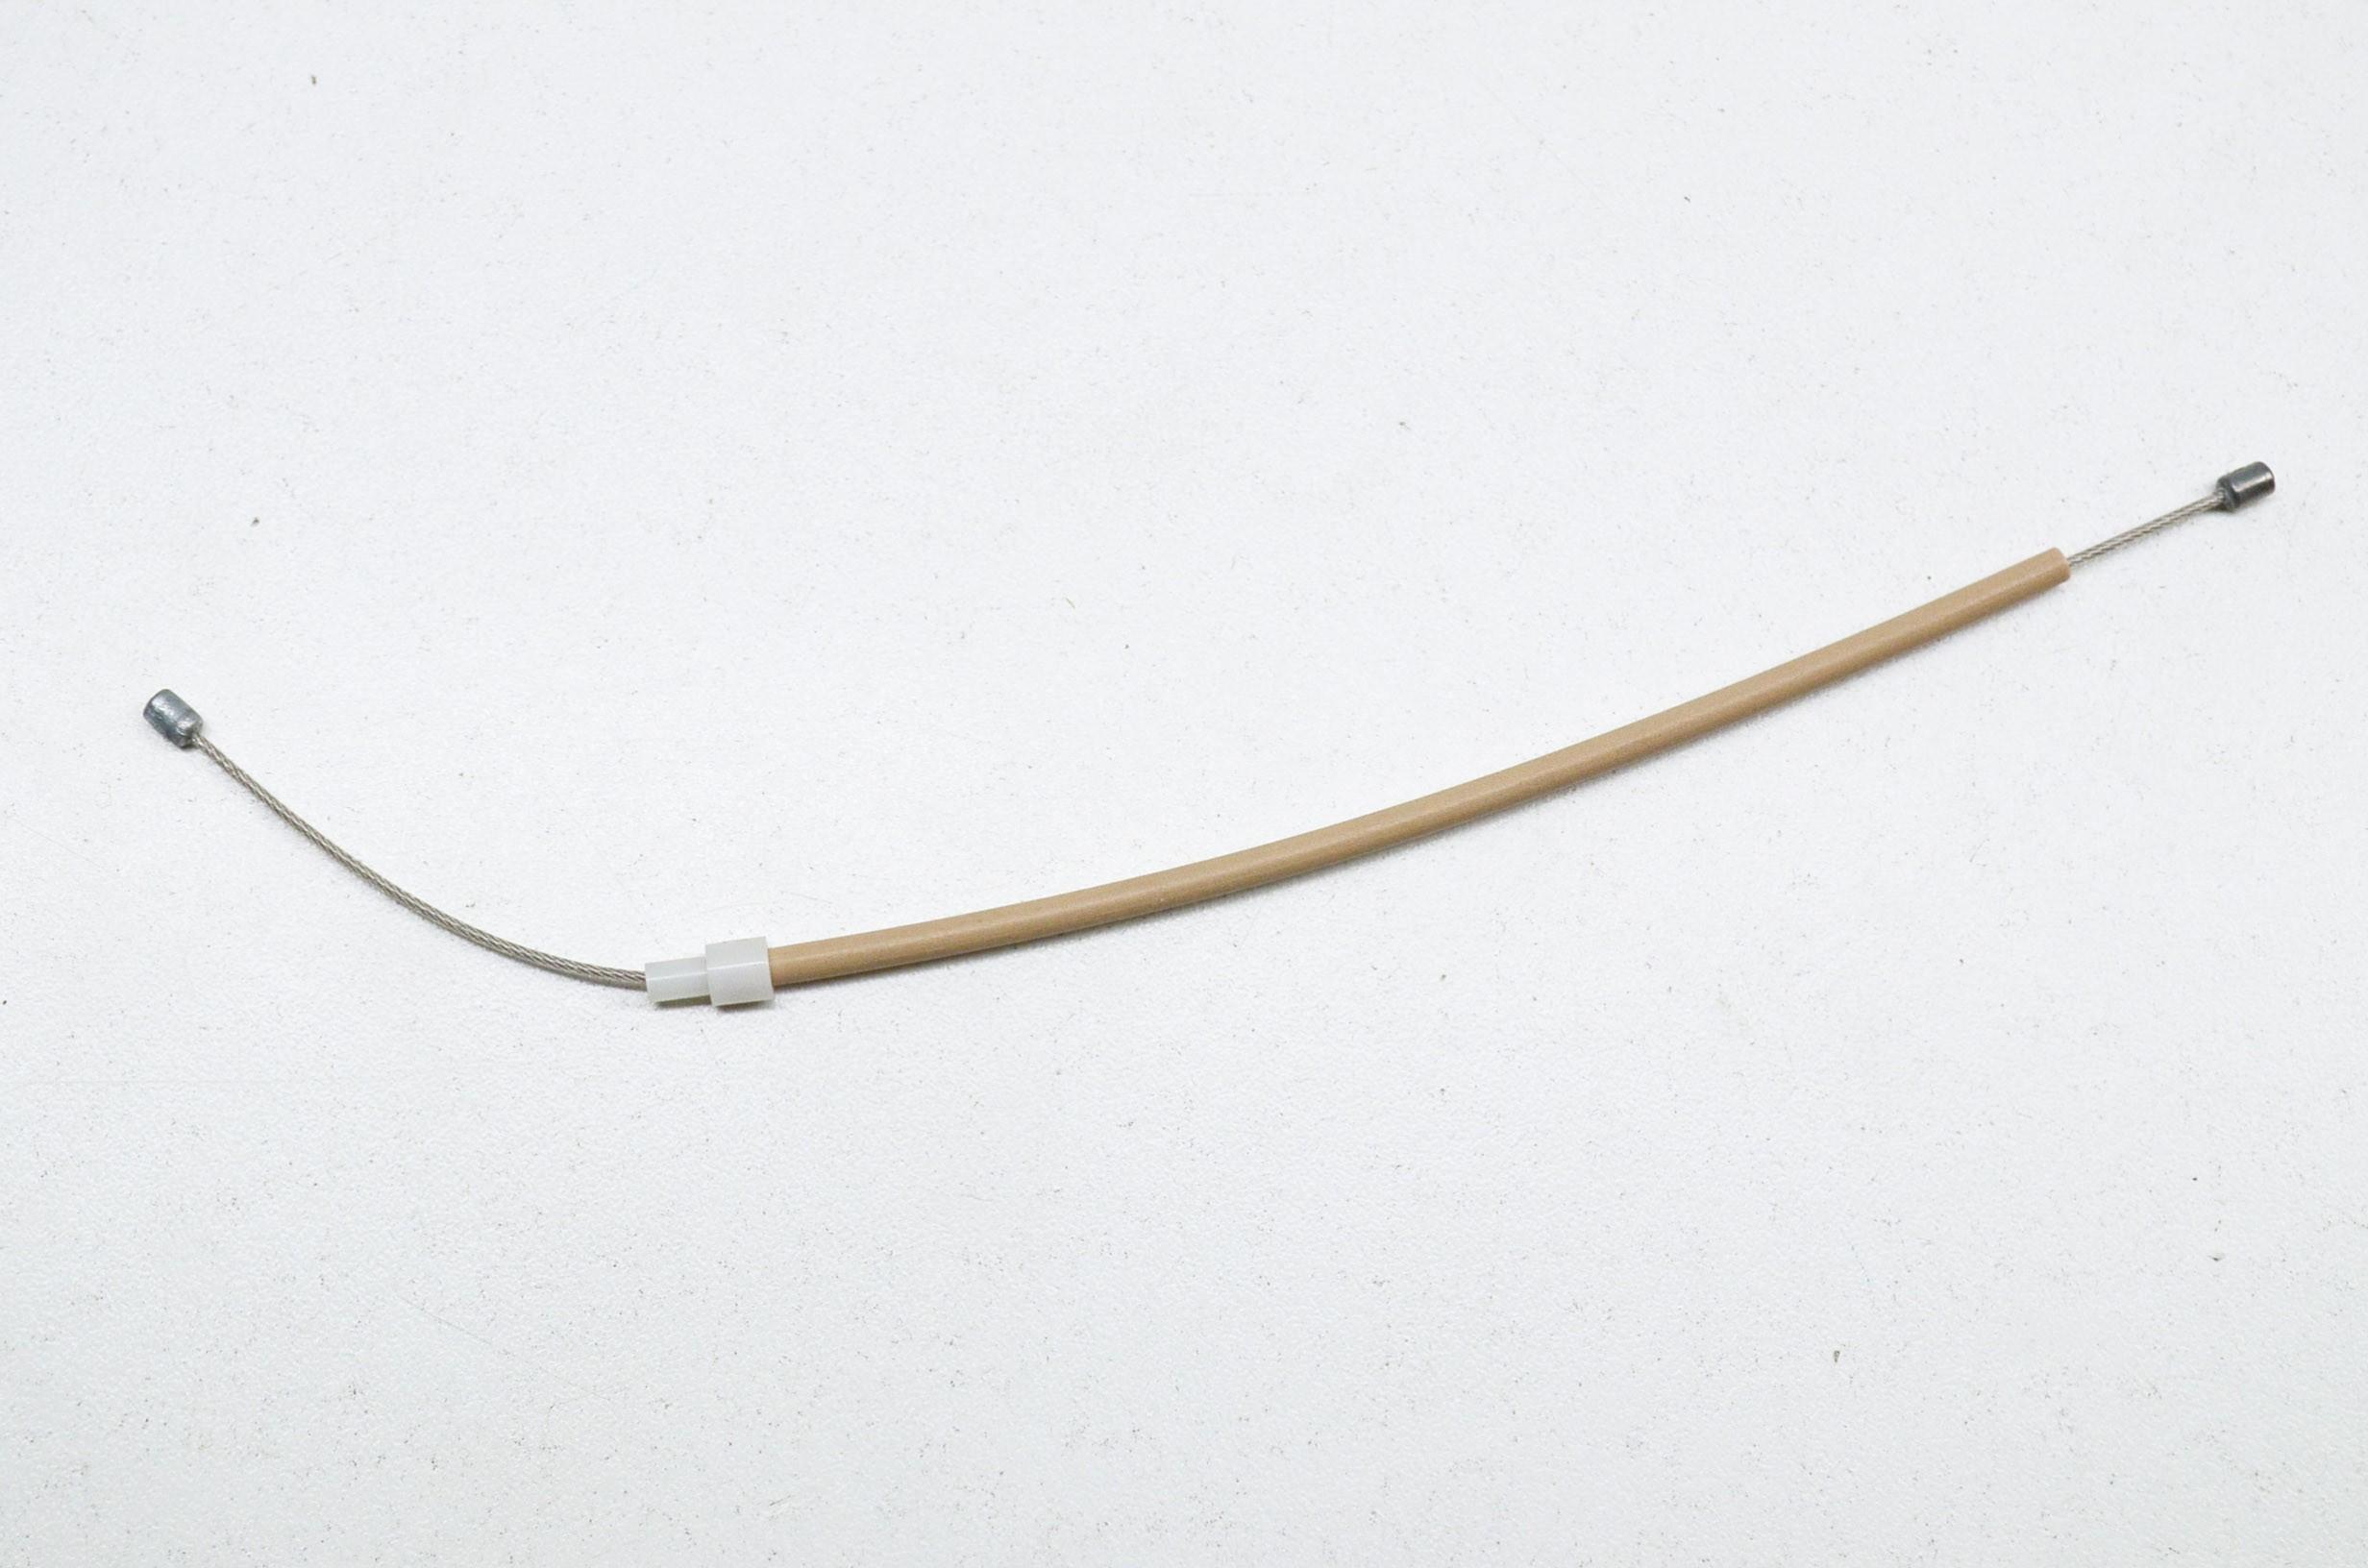 Cablu acceleratie drujba Husqvarna 570, 575 XP, 576 XP